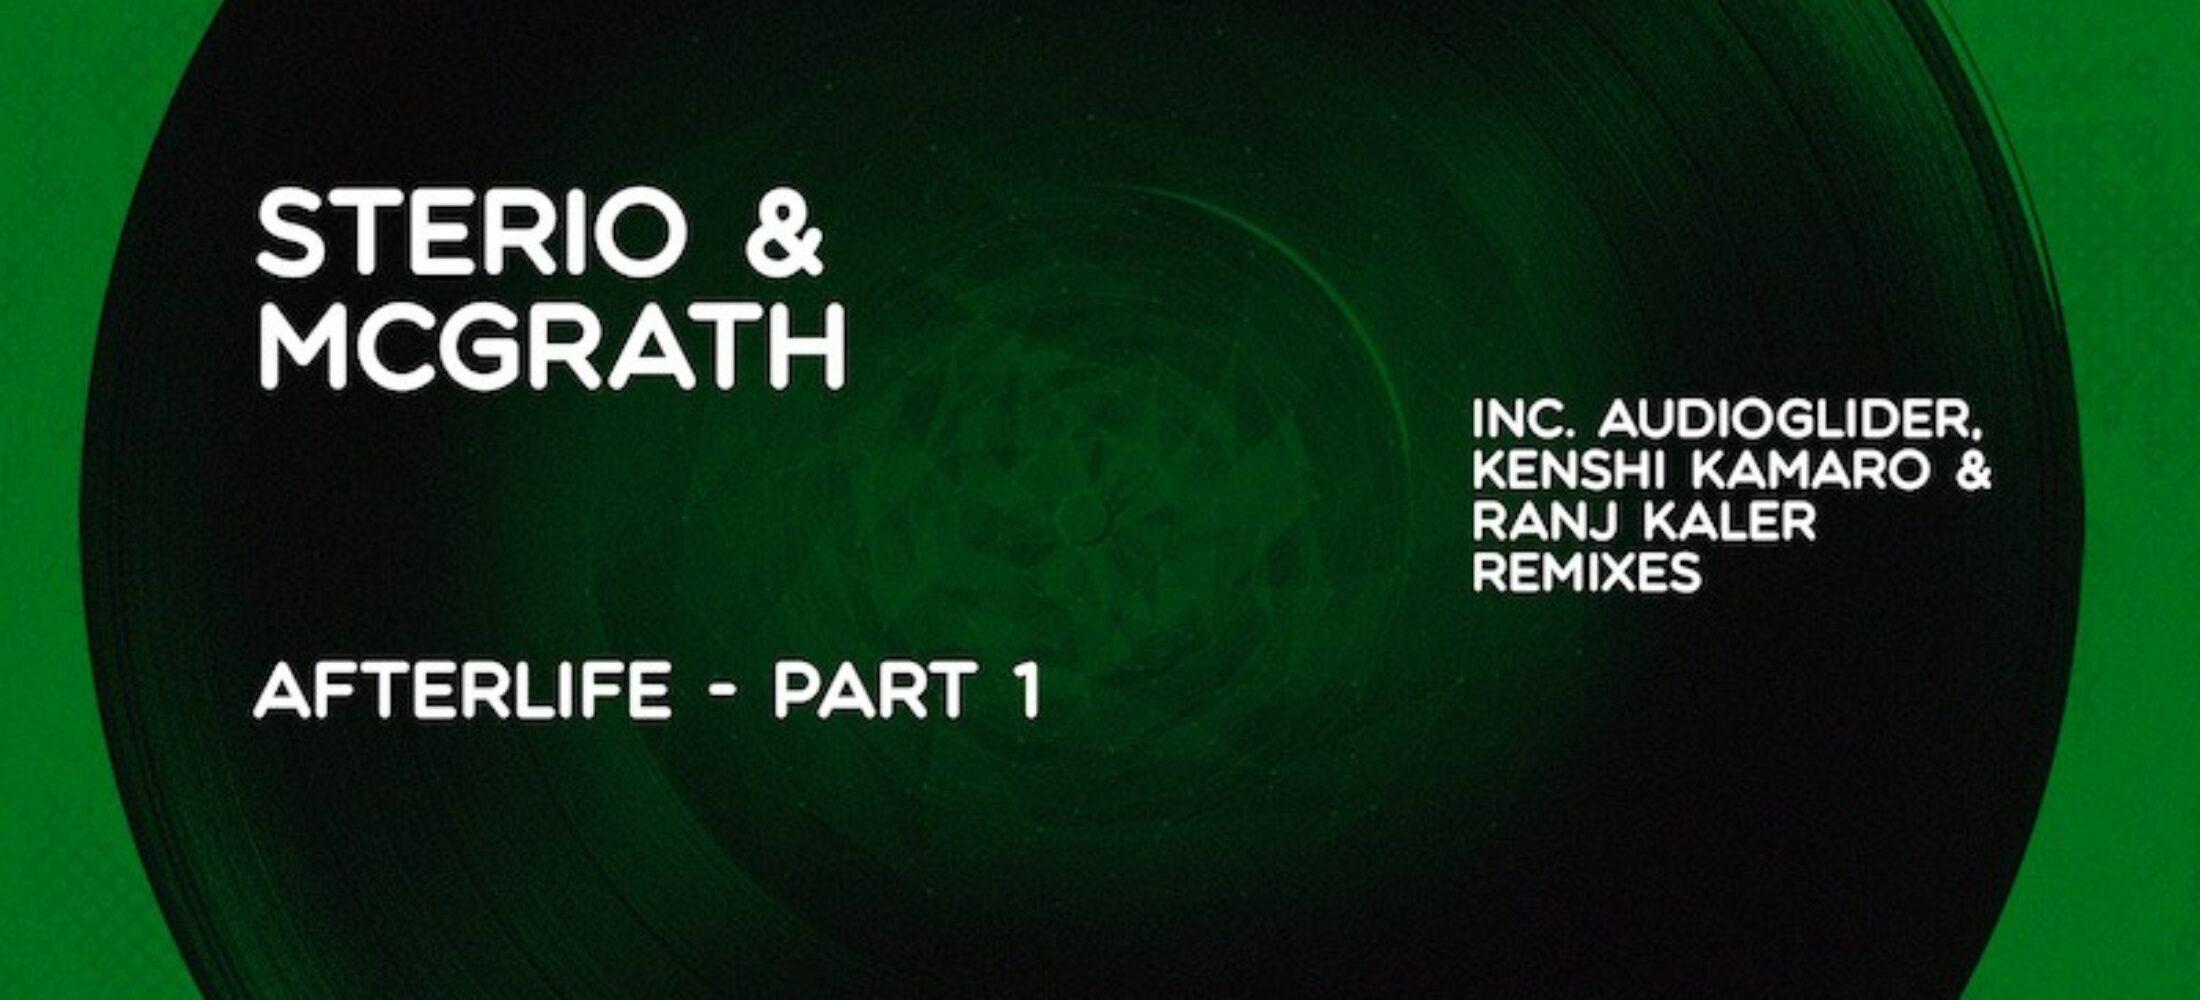 New Release - Sterio & McGrath - Afterlife [Pt. 1]